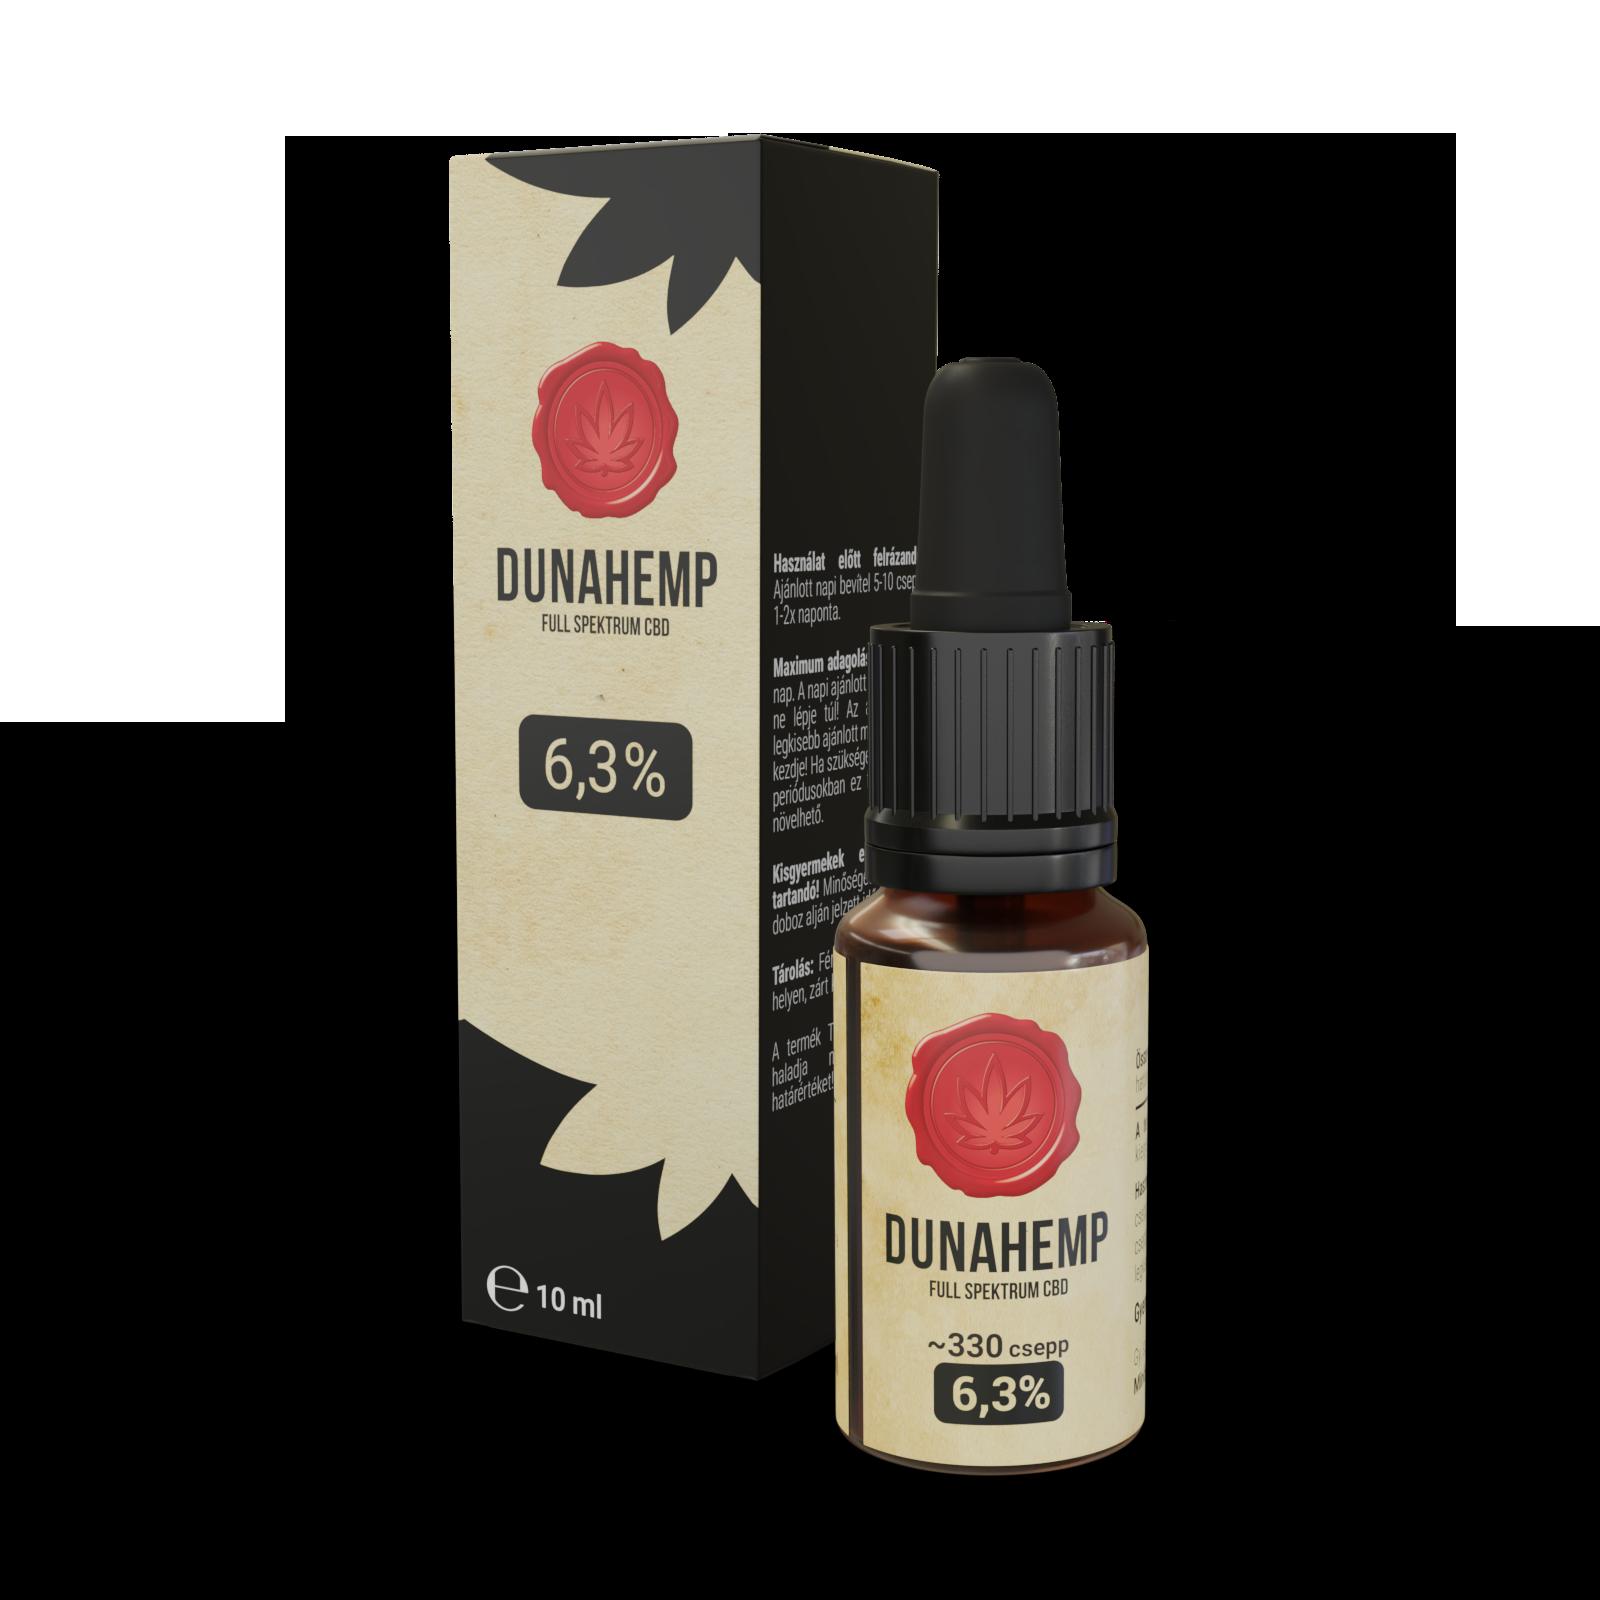 DUNAHEMP Full Spektrum CBD 6,3% - Kendertér